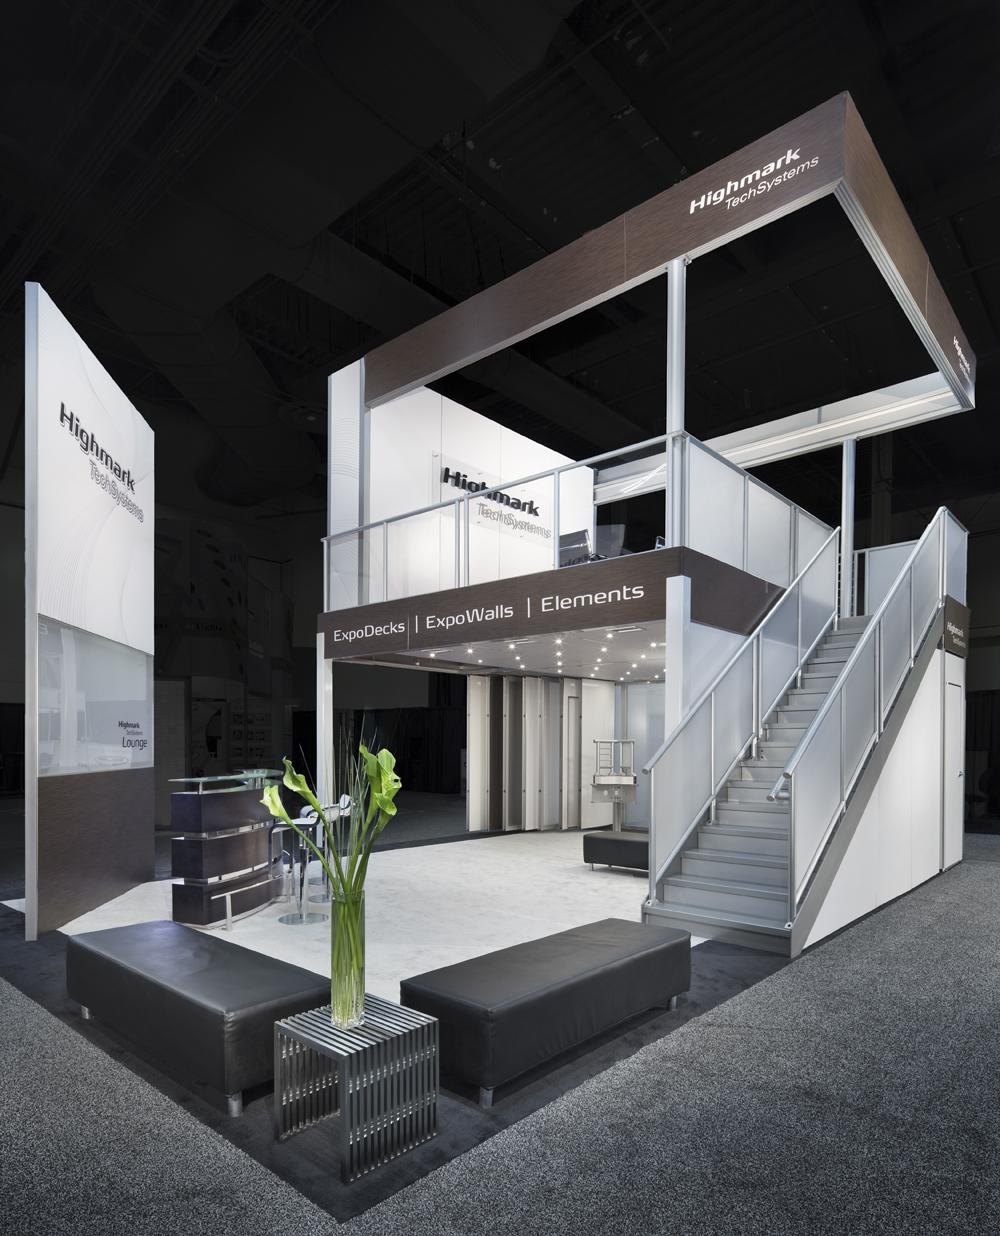 Highmark TechSystems Exhibit